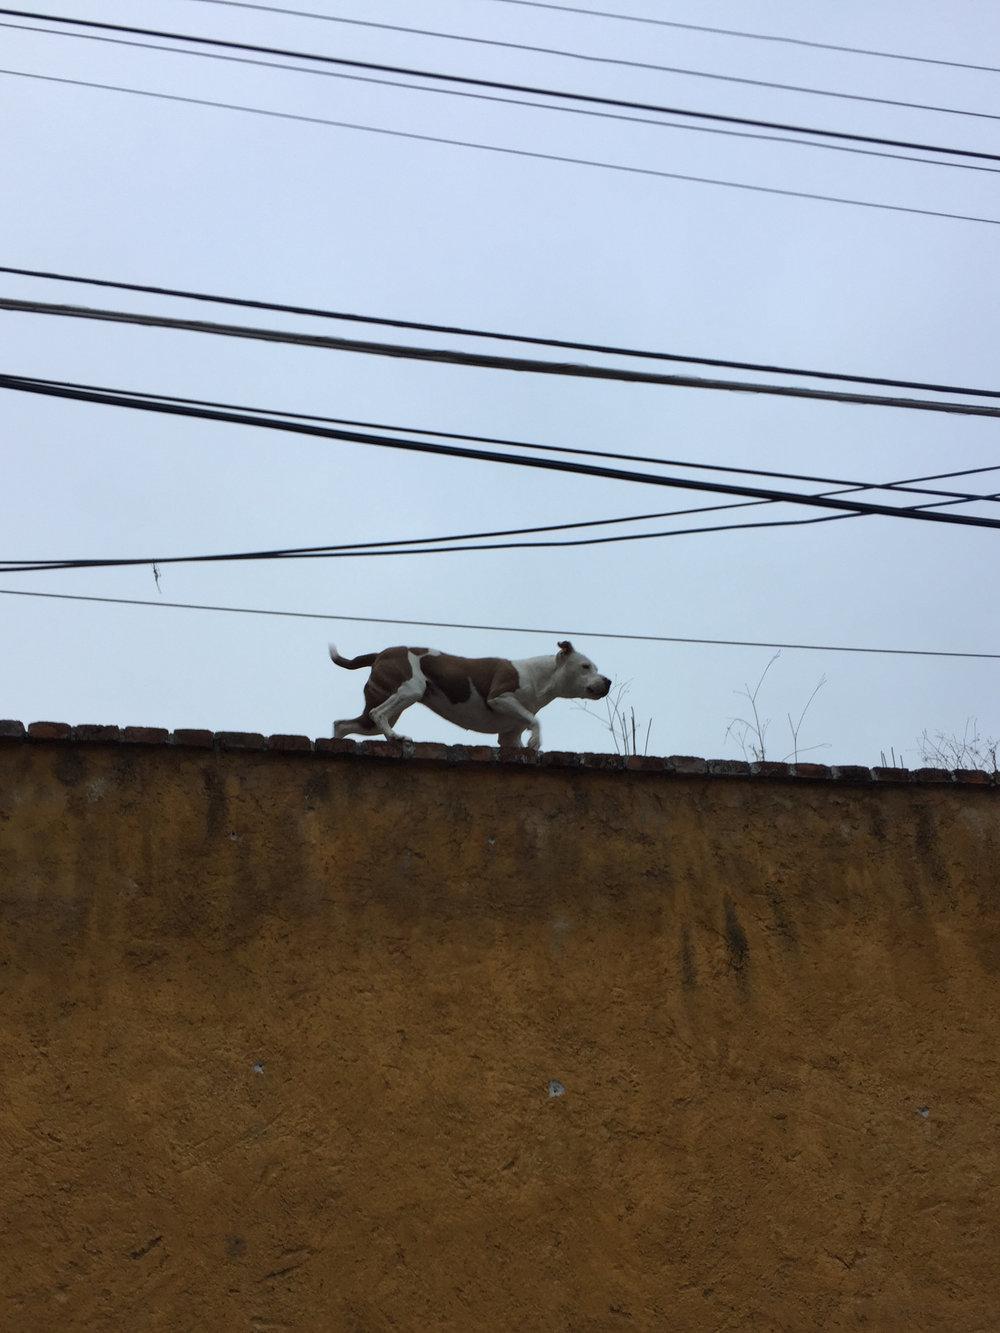 Roof dog walking its territory